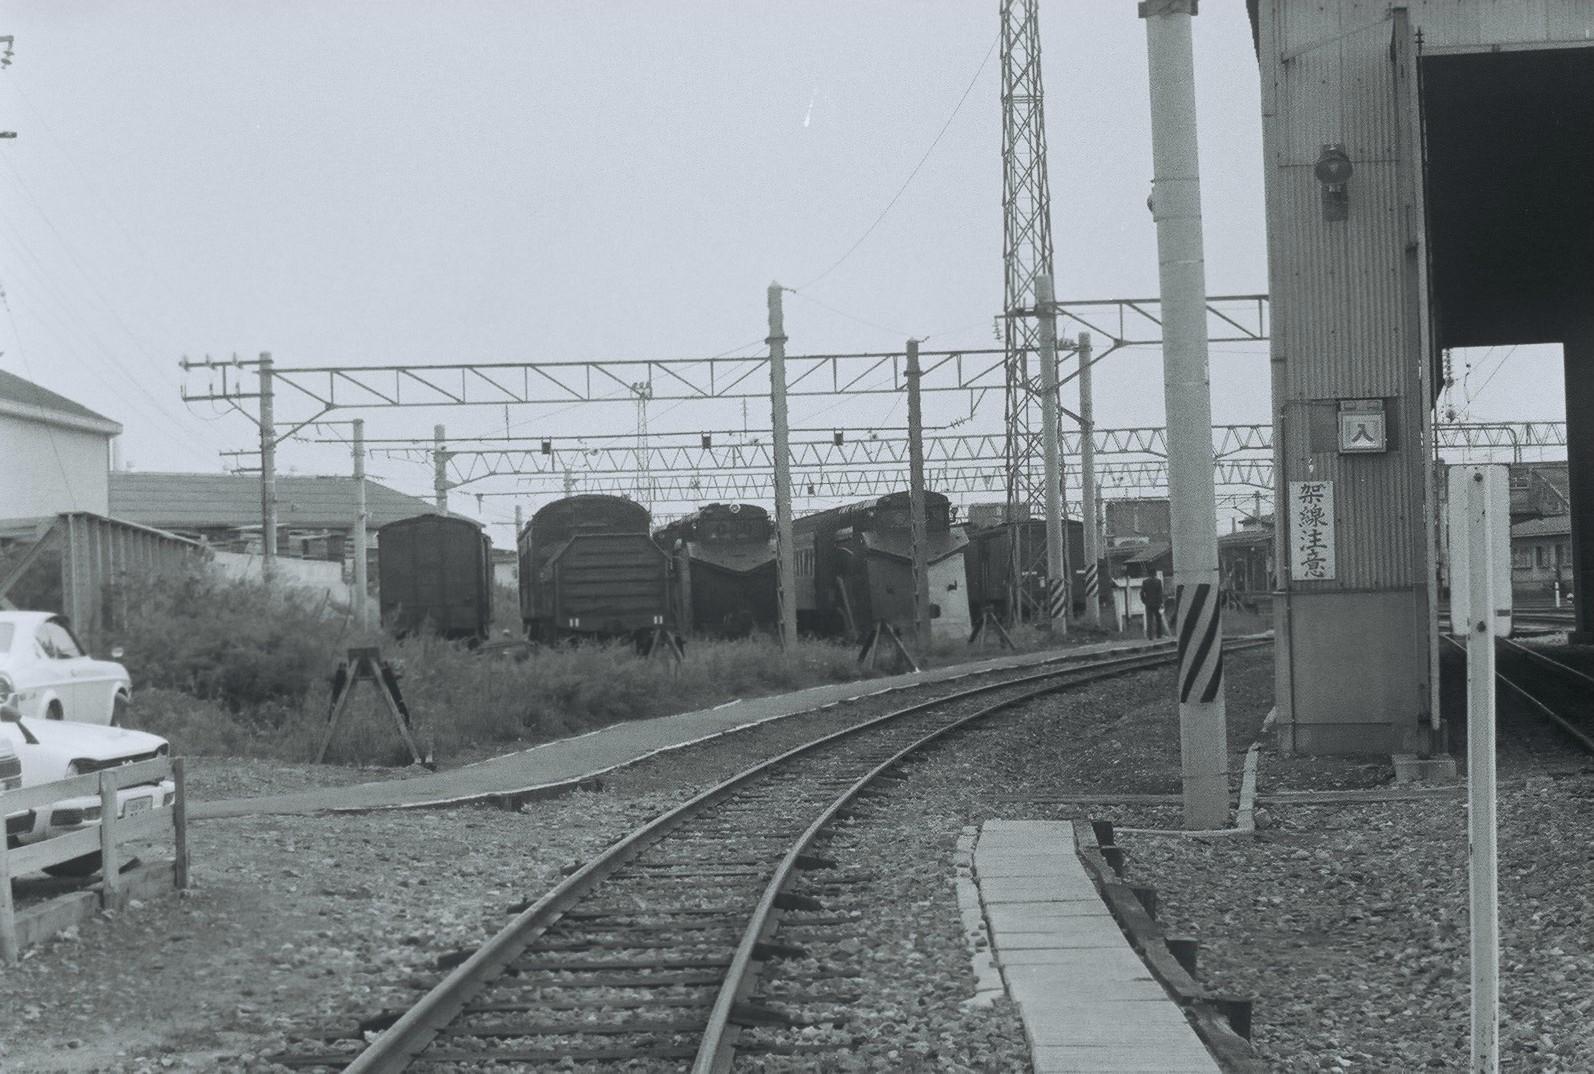 197810050131